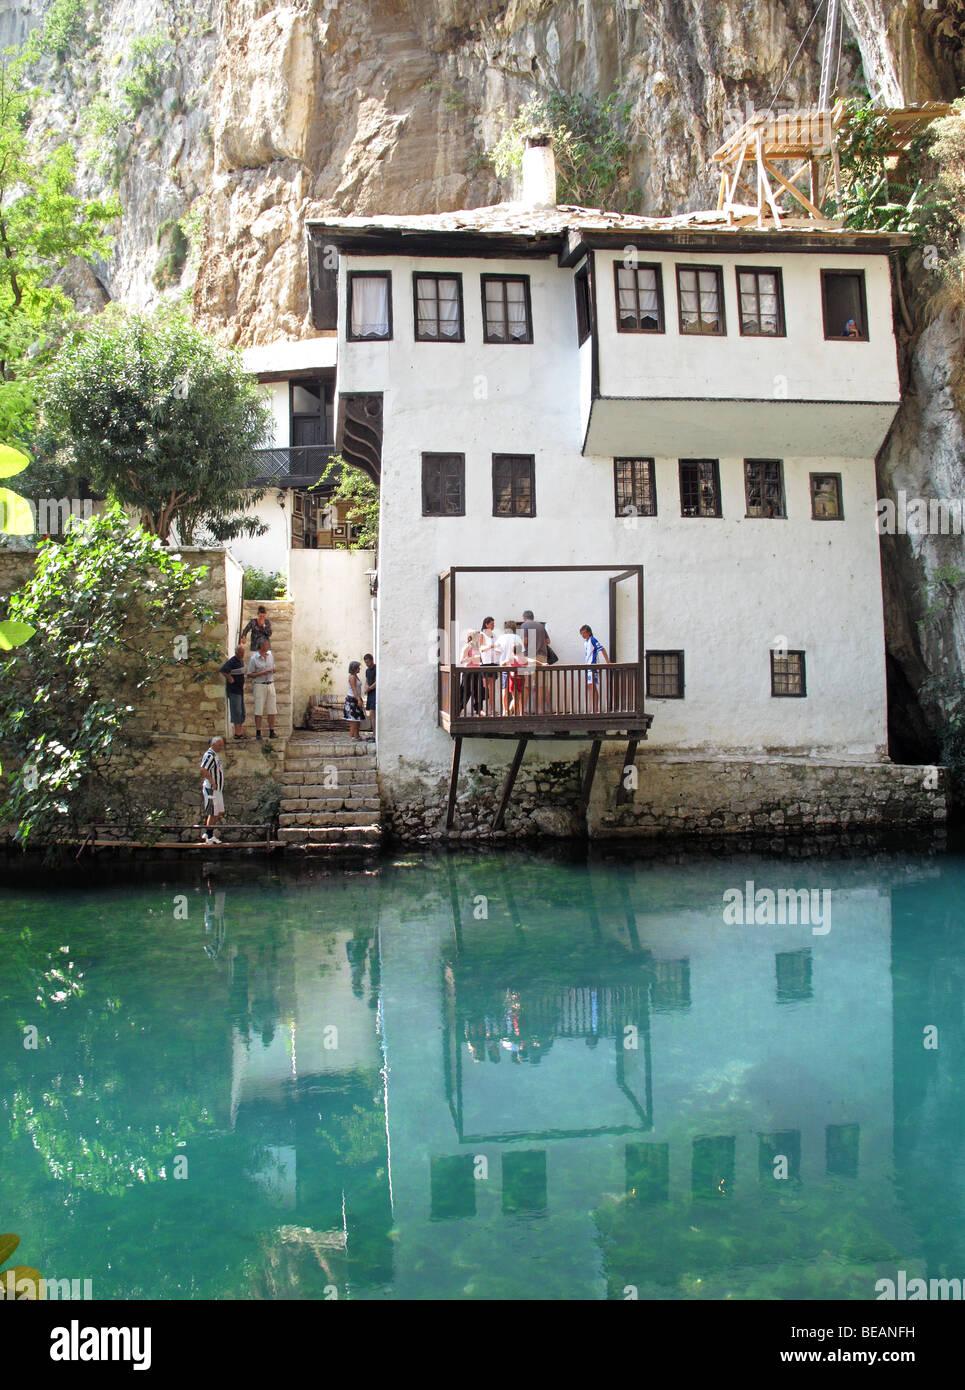 Bosnia and Herzegovina, Blagaj, 16th century Tekija, Dervish monastery on Buna river. About 15km southeast of Mostar. - Stock Image